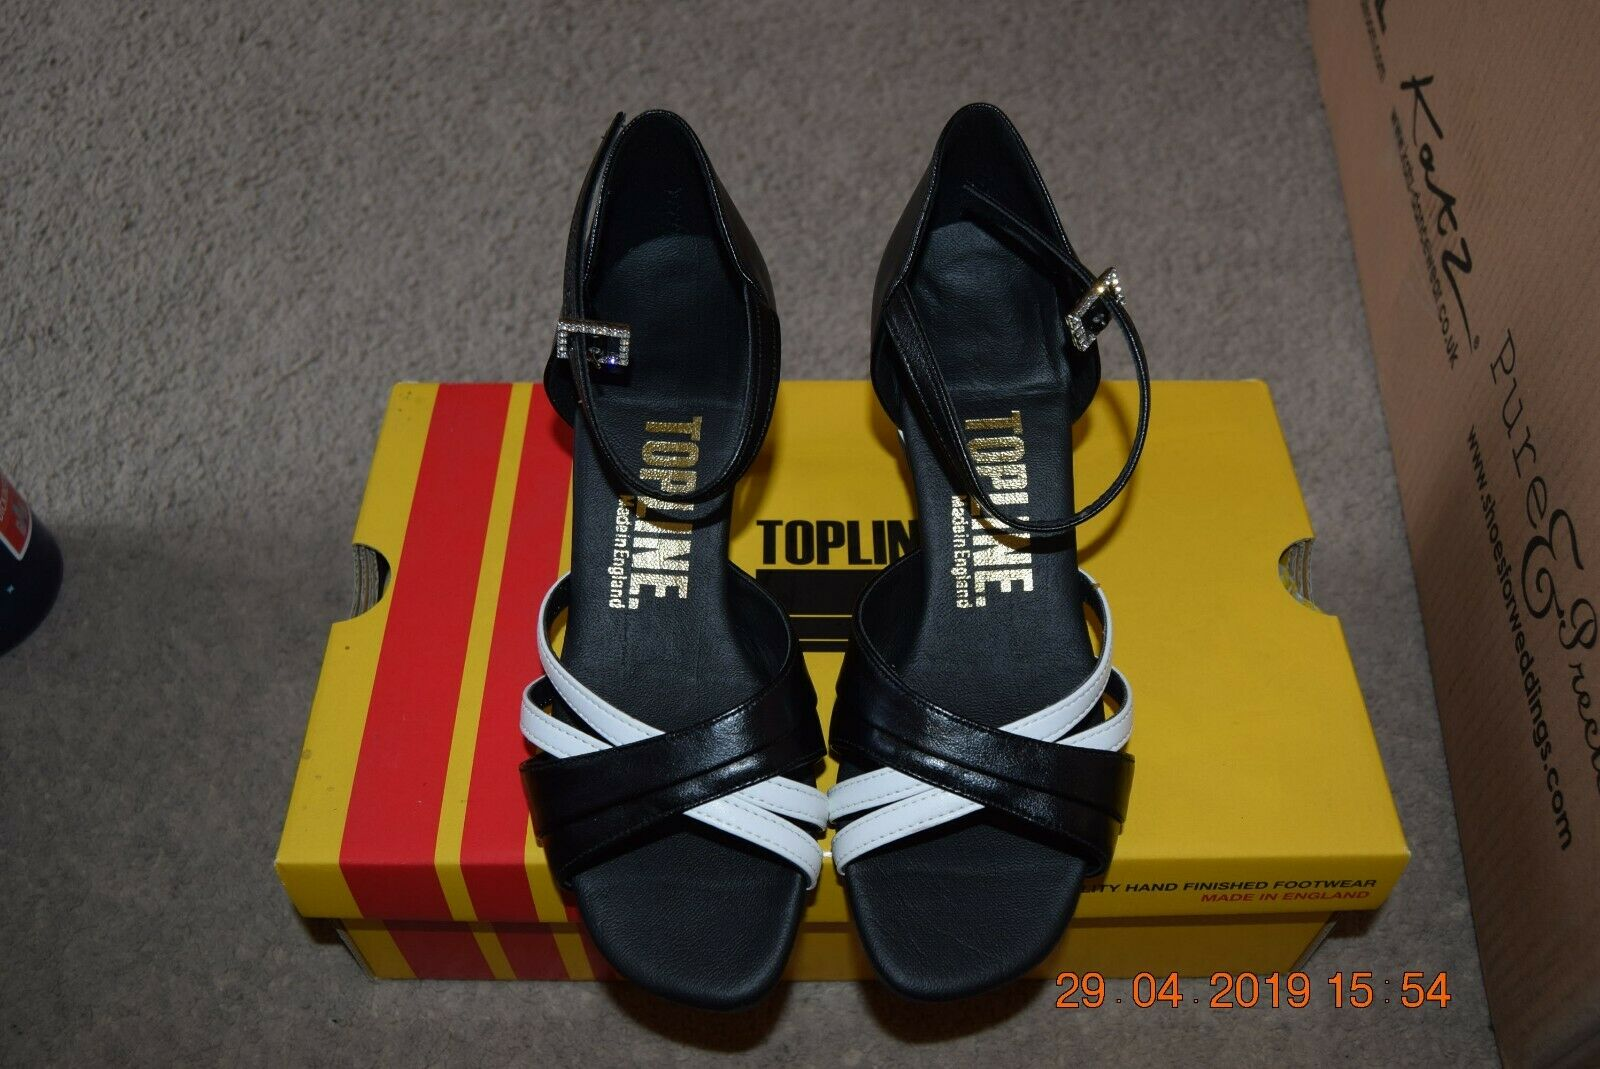 Black and White Katz/Topline Chelsea social ballroom/latin dance shoes-size 2